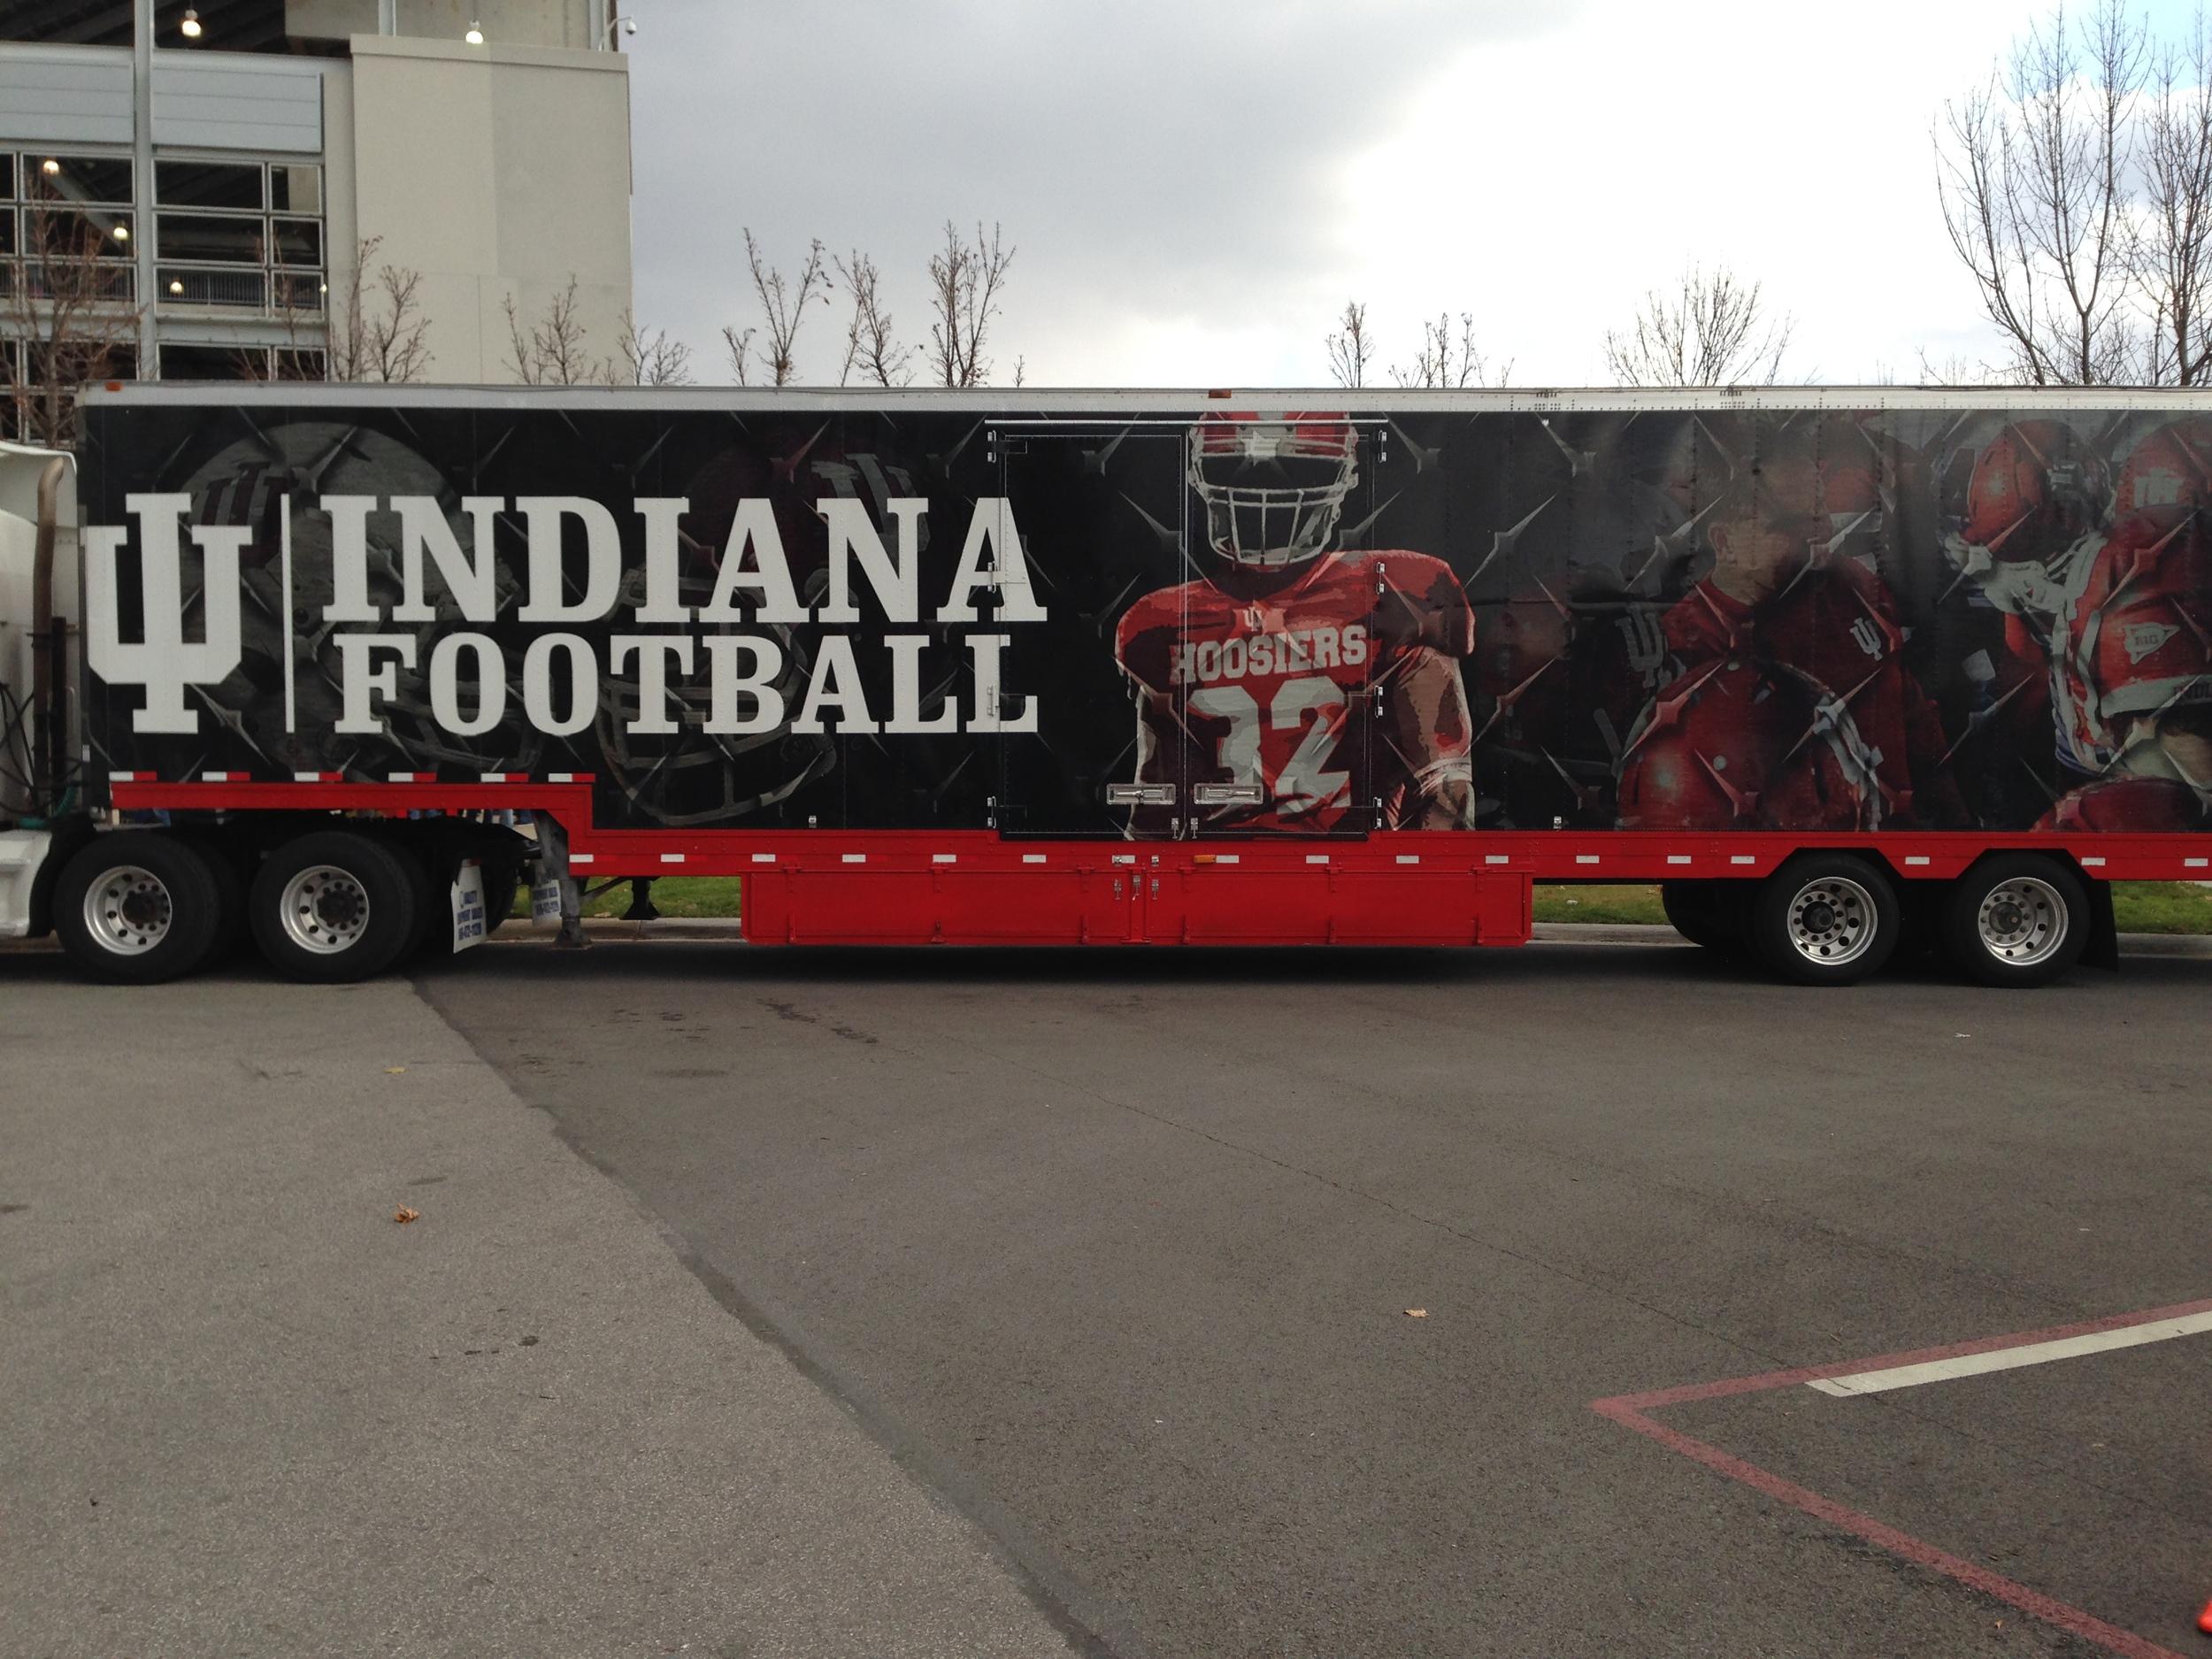 The Indiana Football Equipment truck